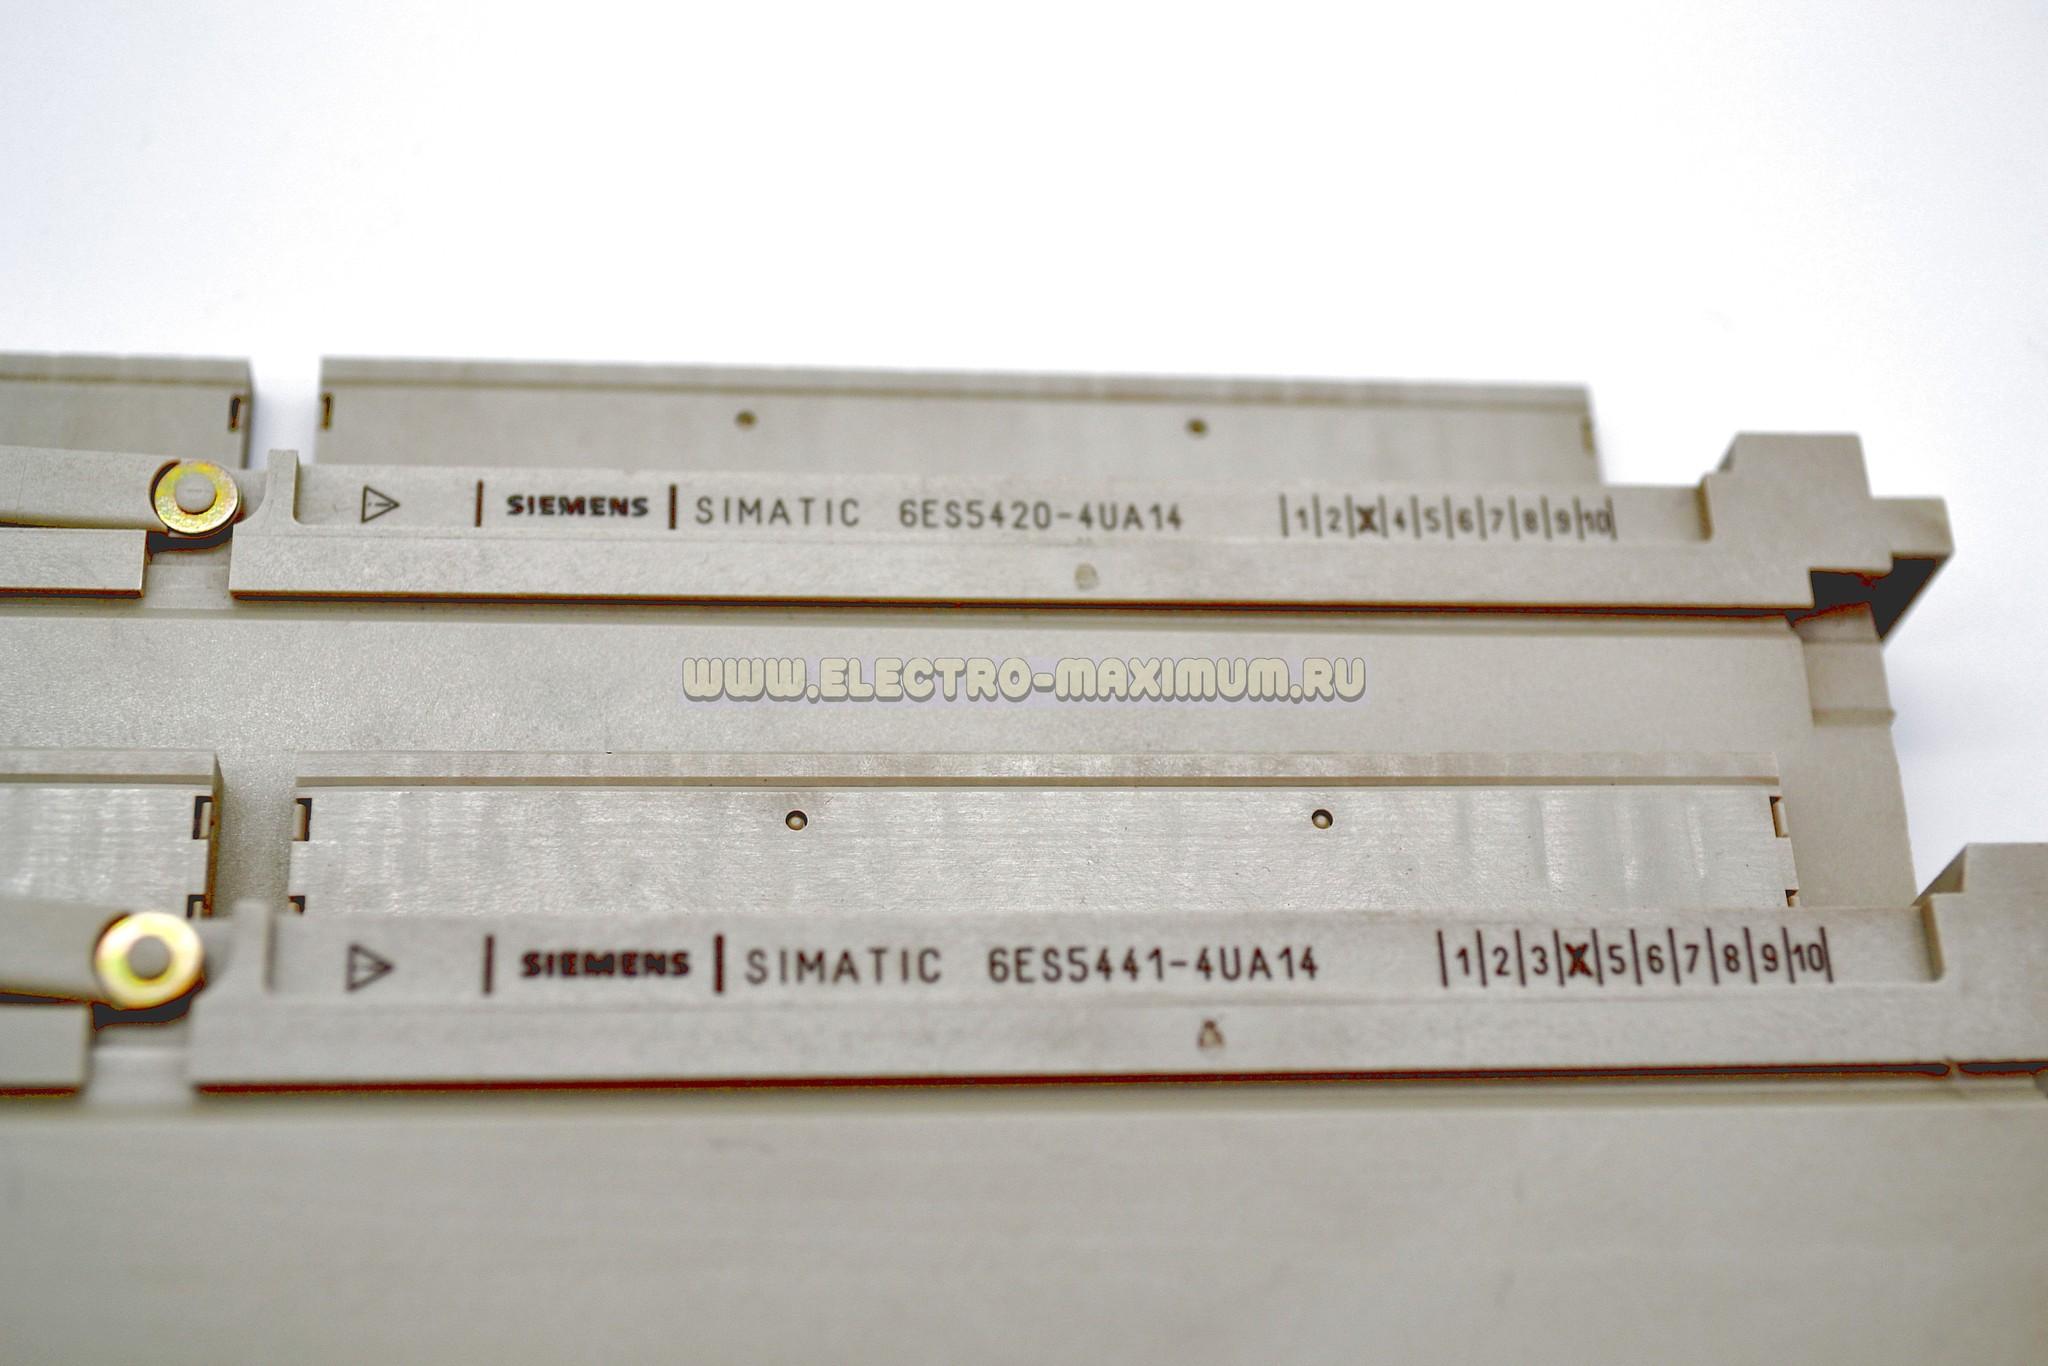 SIMATIC S5 441-4 DIGITAL OUTPUT MODULE, SIEMENS 6ES5441-4UA14